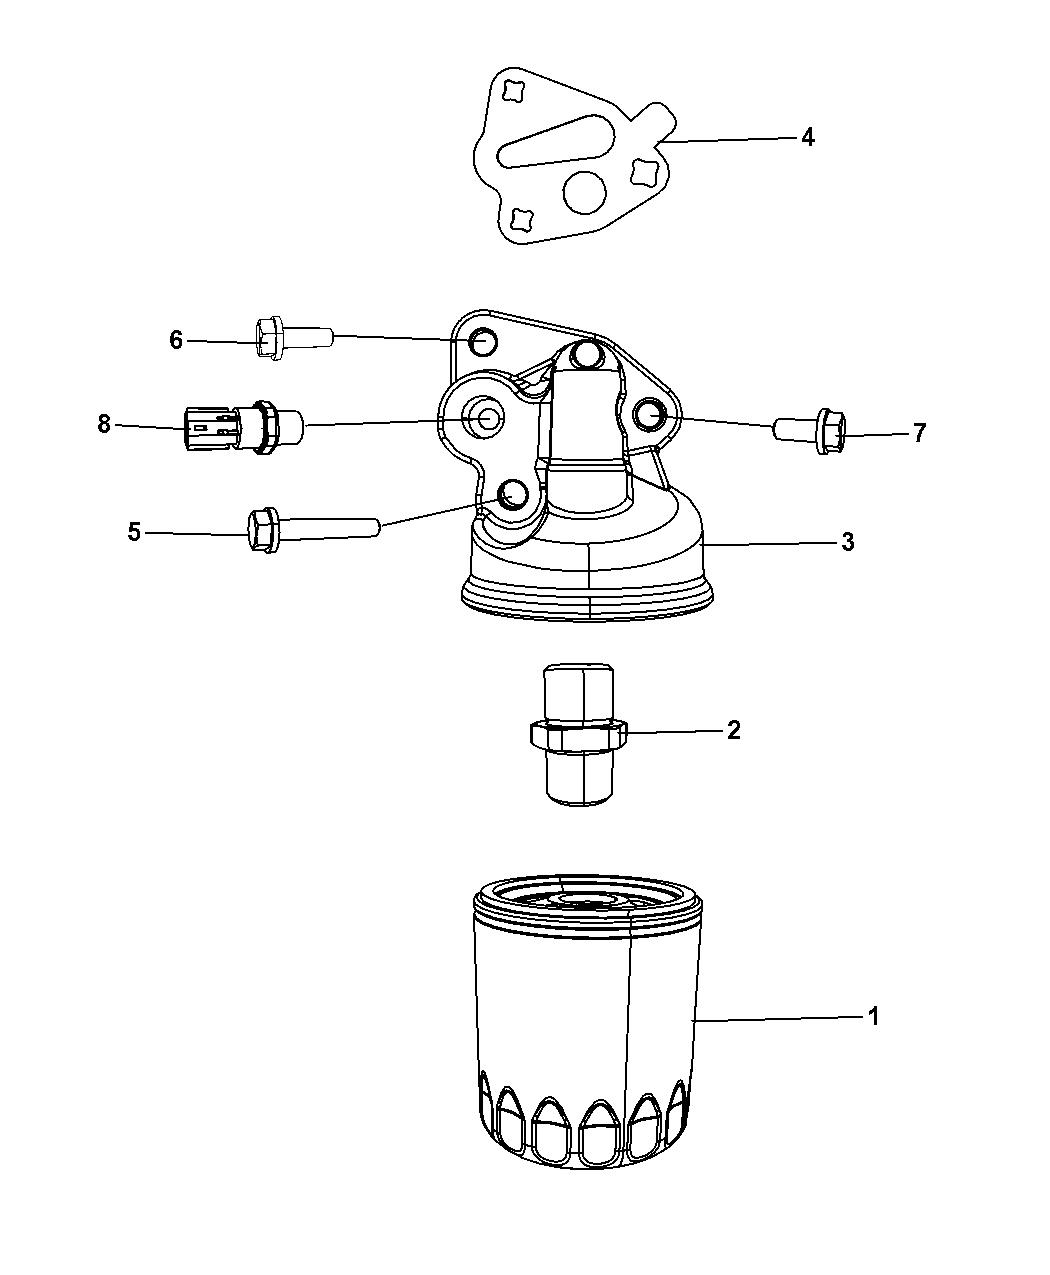 2008 Dodge Grand Caravan Engine Oil Filter Adapter Housing Headlight Wiring Harness Splash Guard Thumbnail